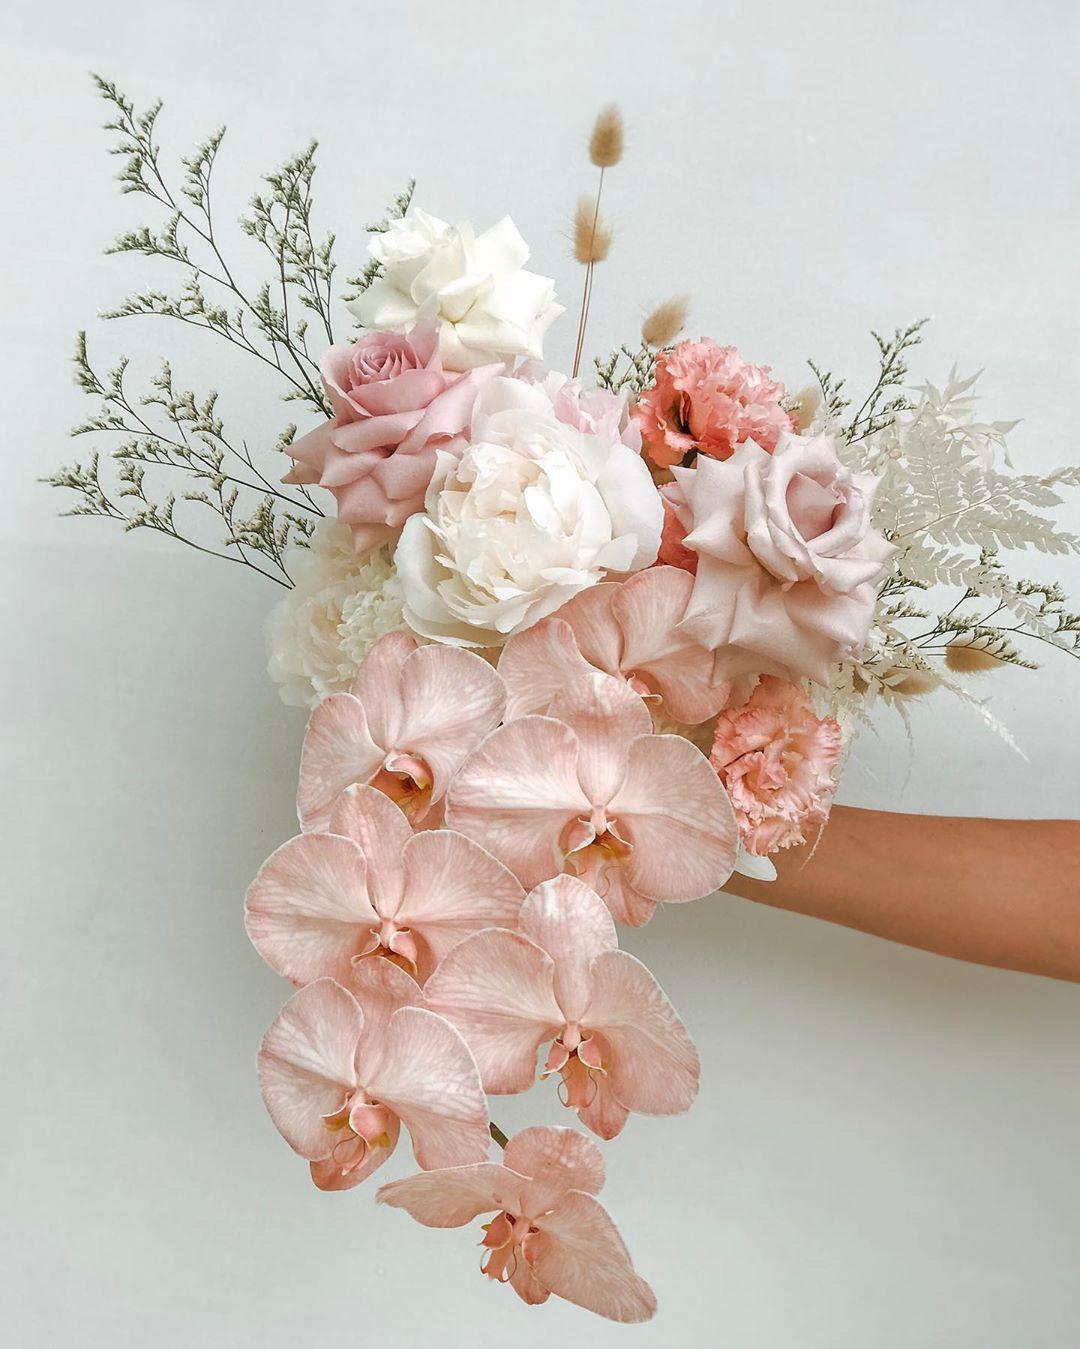 Wilderness Flowers On Instagram Fairy Floss Bouquet In 2020 Bridal Bouquet